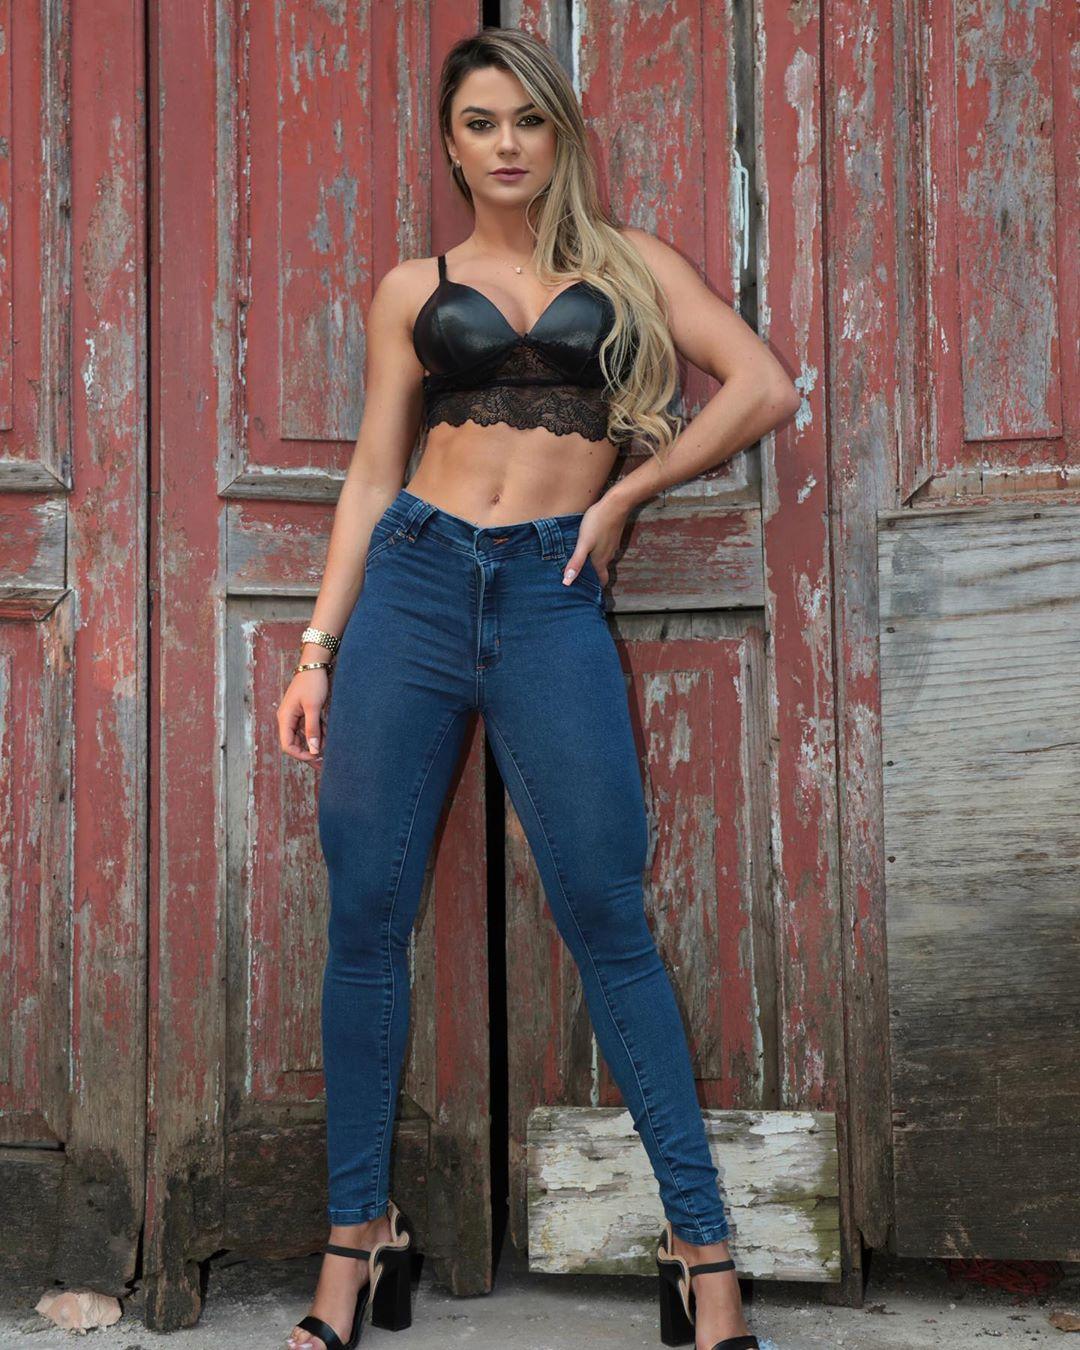 Amanda-Franca-Wallpapers-Insta-Fit-Bio-4